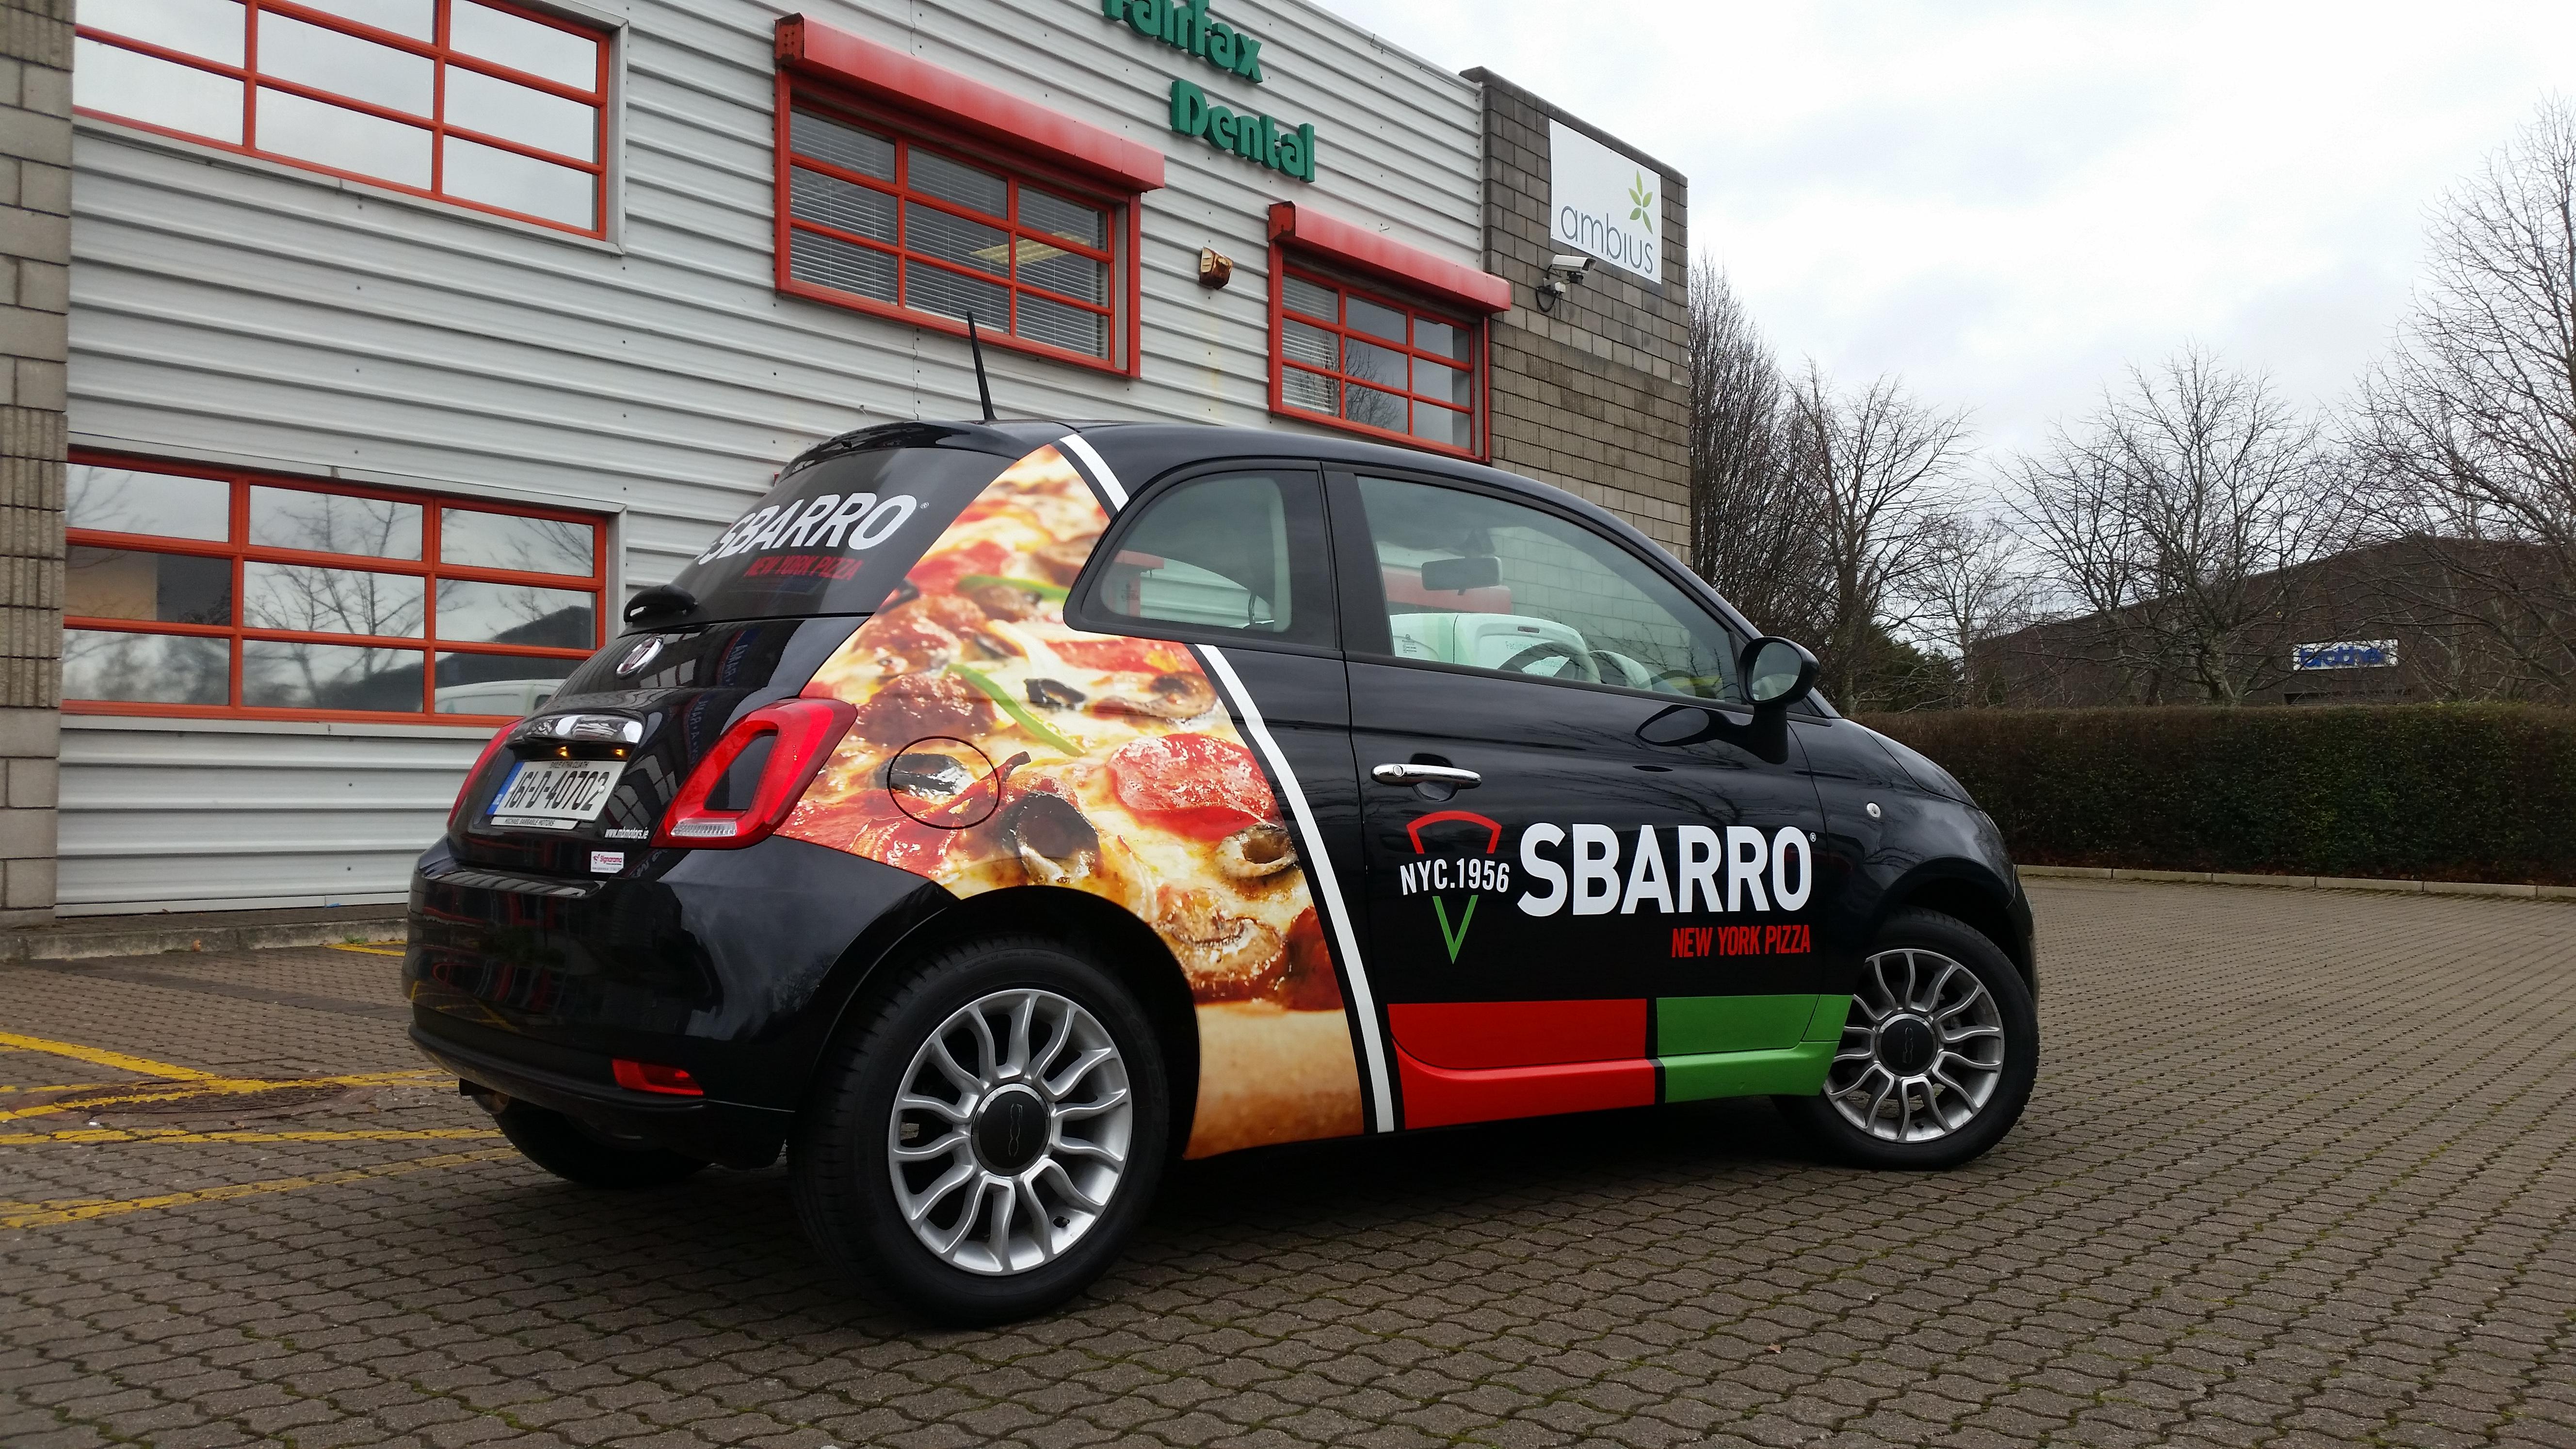 SBARRO Fleet Vehicle Graphics